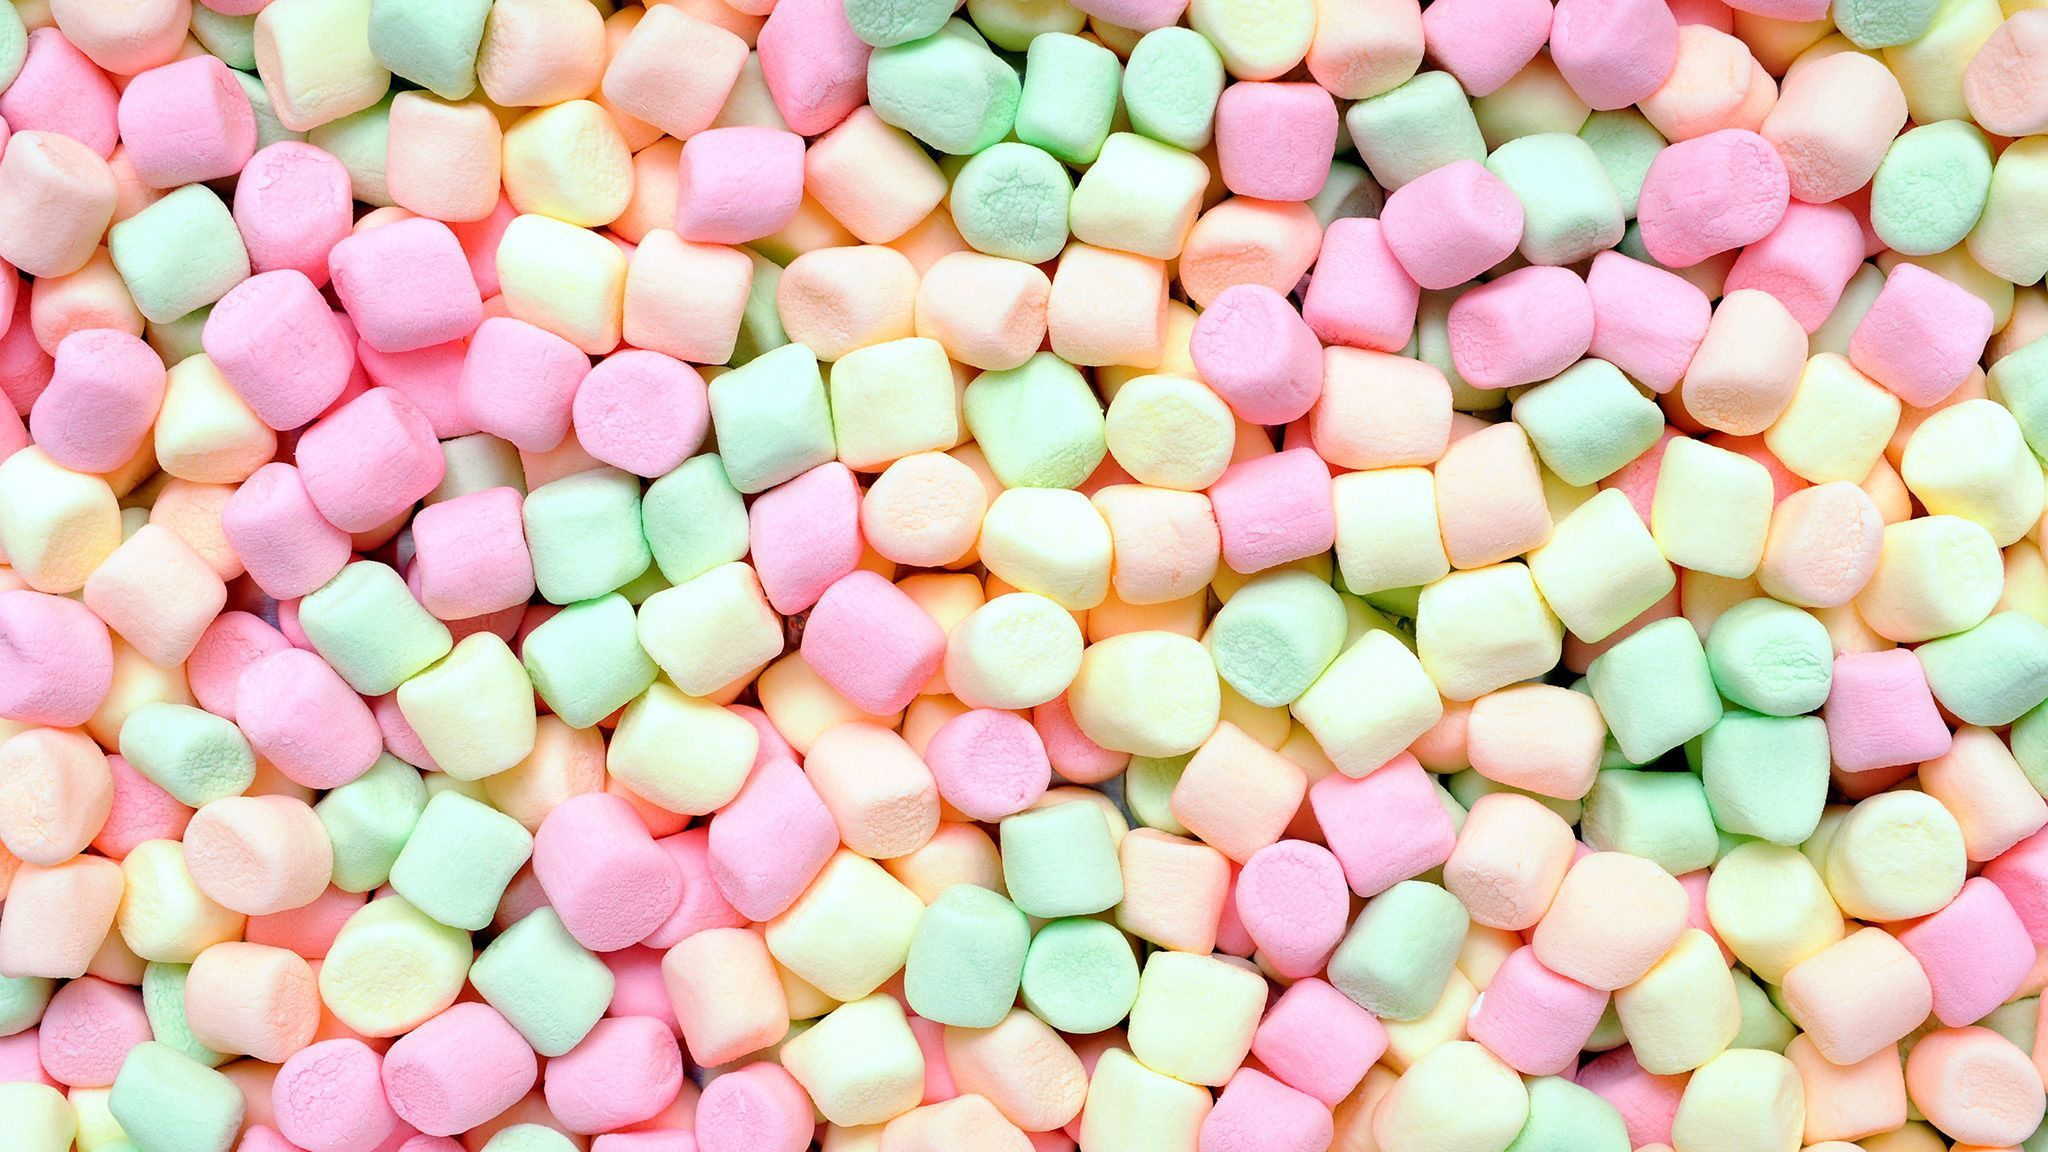 2048x1152 Cute Marshmallow Wallpapers 61 Images Banner De